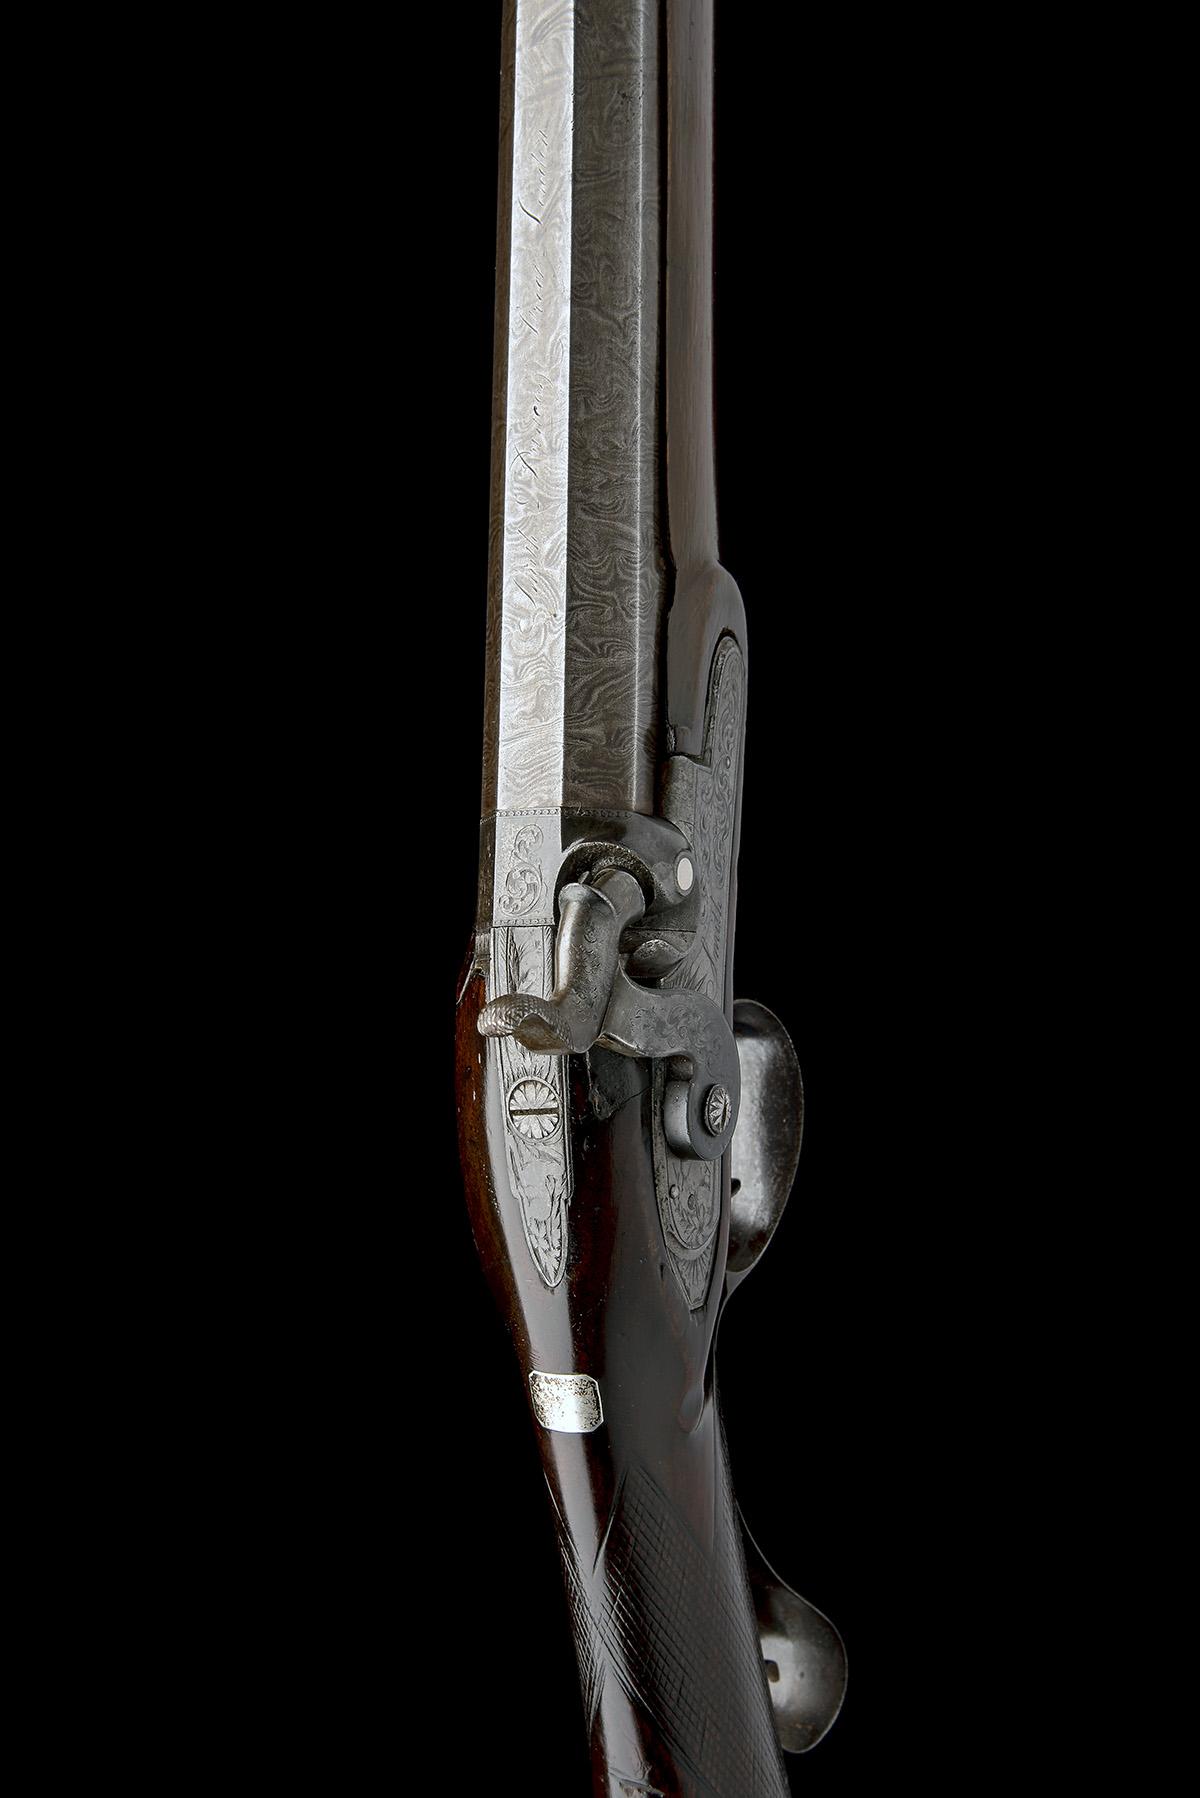 SMITH, LONDON A 12-BORE PERCUSSION SINGLE-BARRELLED SPORTING-GUN, no visible serial number, circa - Image 6 of 8